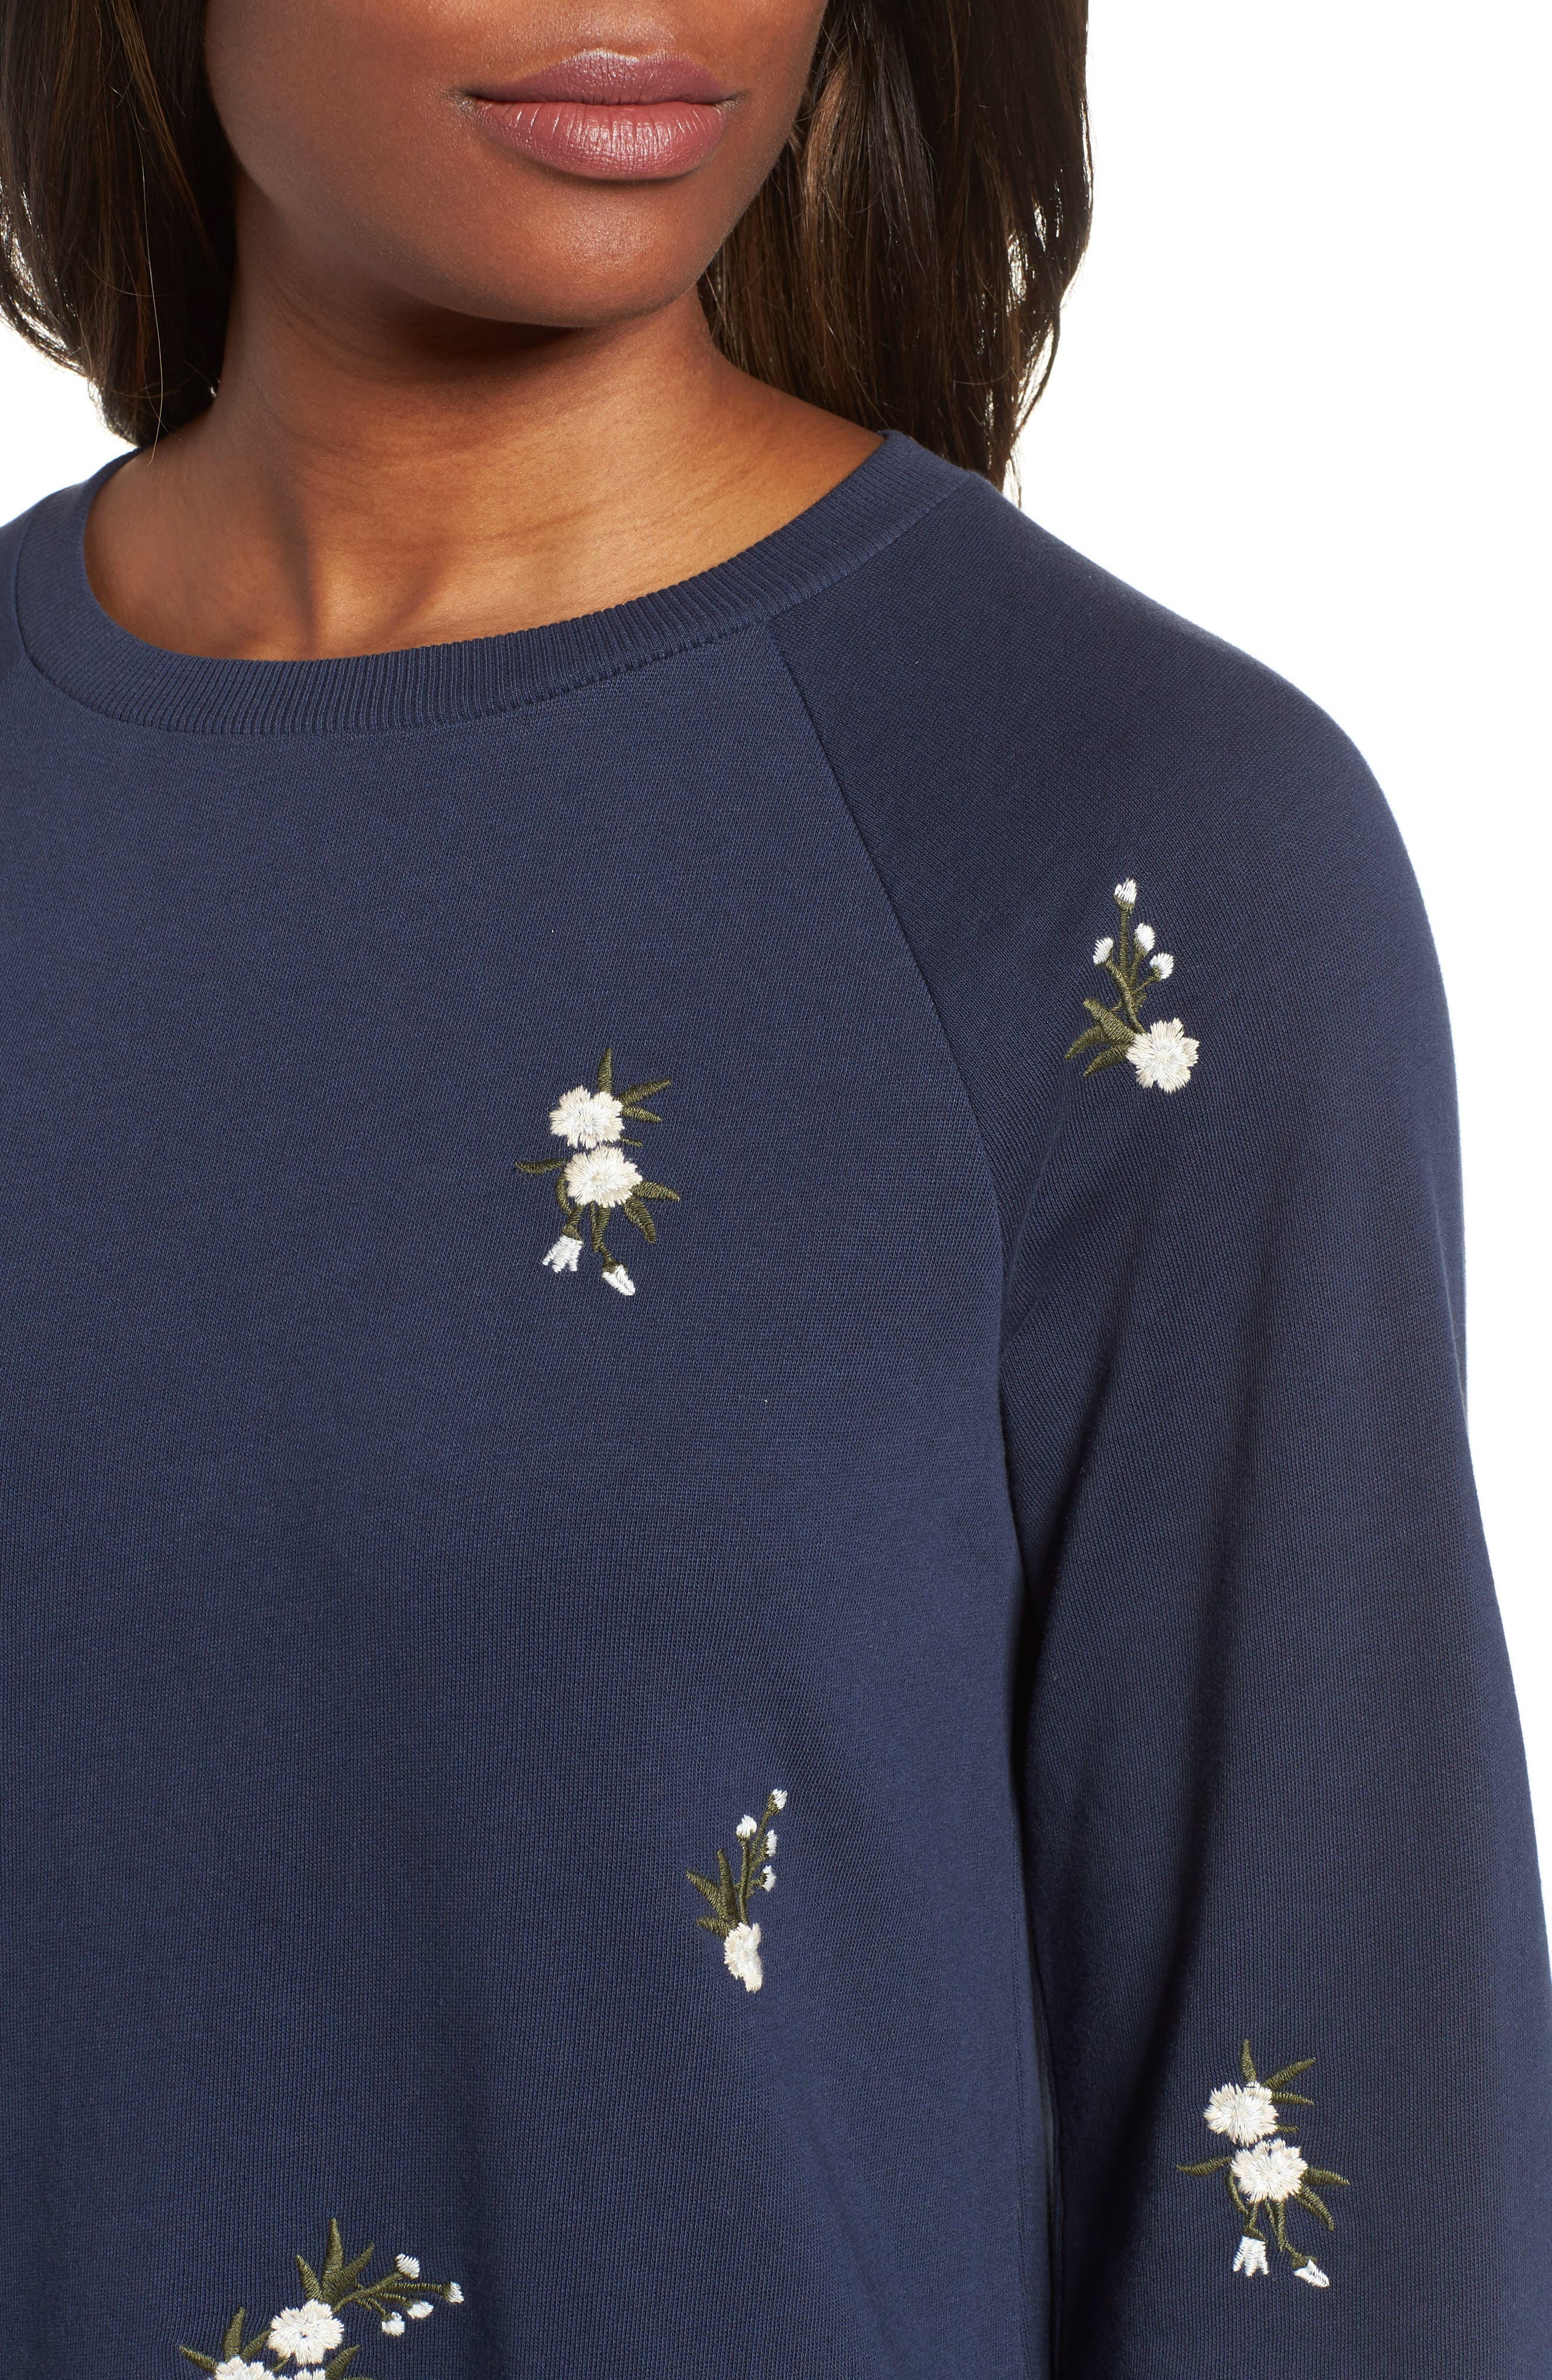 Embroidered Sweatshirt Dress,                             Alternate thumbnail 4, color,                             NAVY INDIGO GAYLE EMB